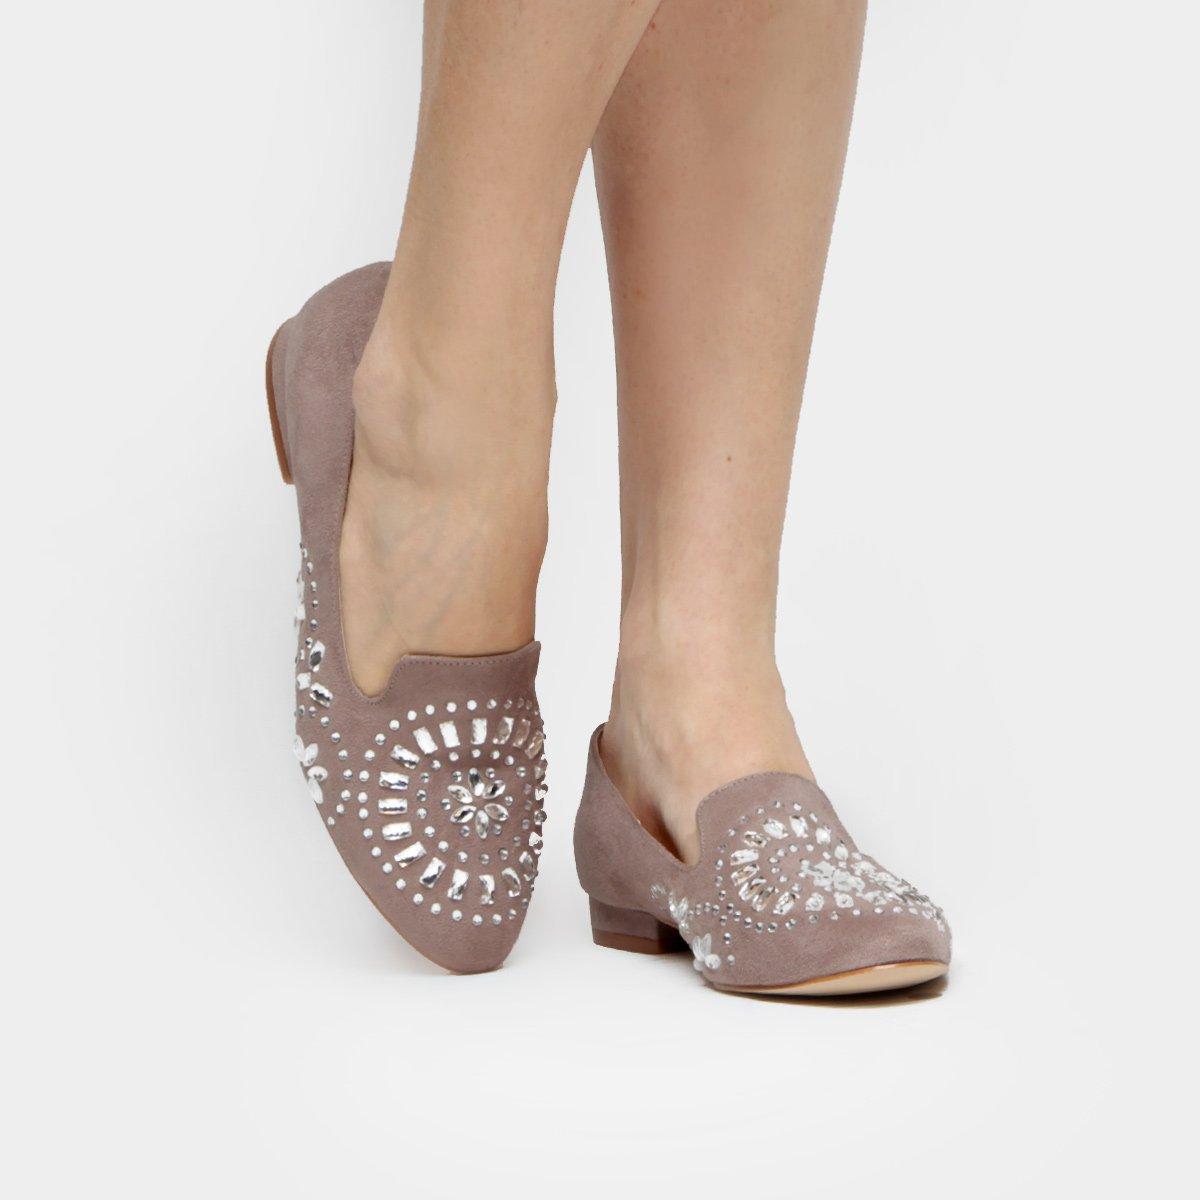 Slipper Slipper Cinza Hotfix Shoestock Slipper Cinza Hotfix Shoestock Shoestock IXwtBI5q